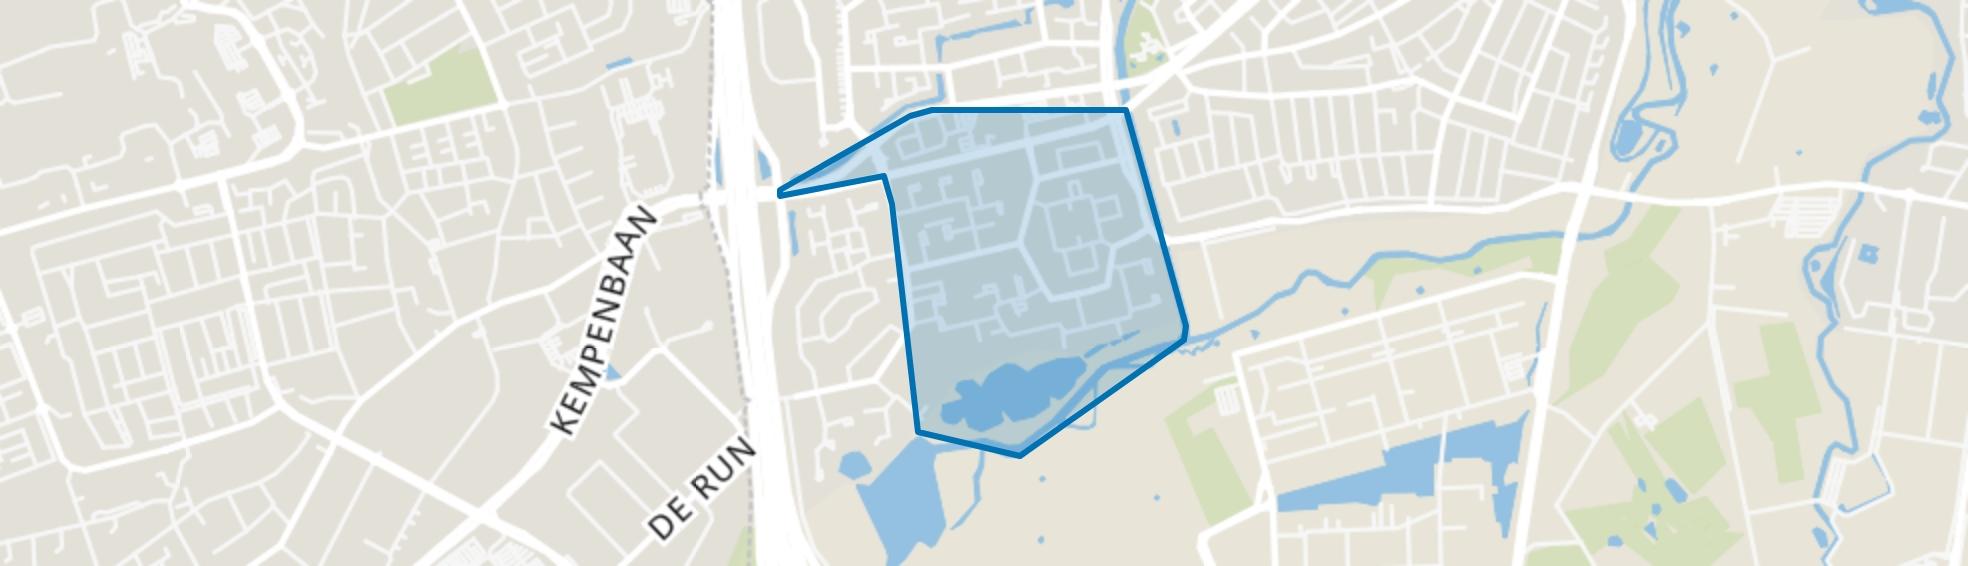 Hanevoet, Eindhoven map